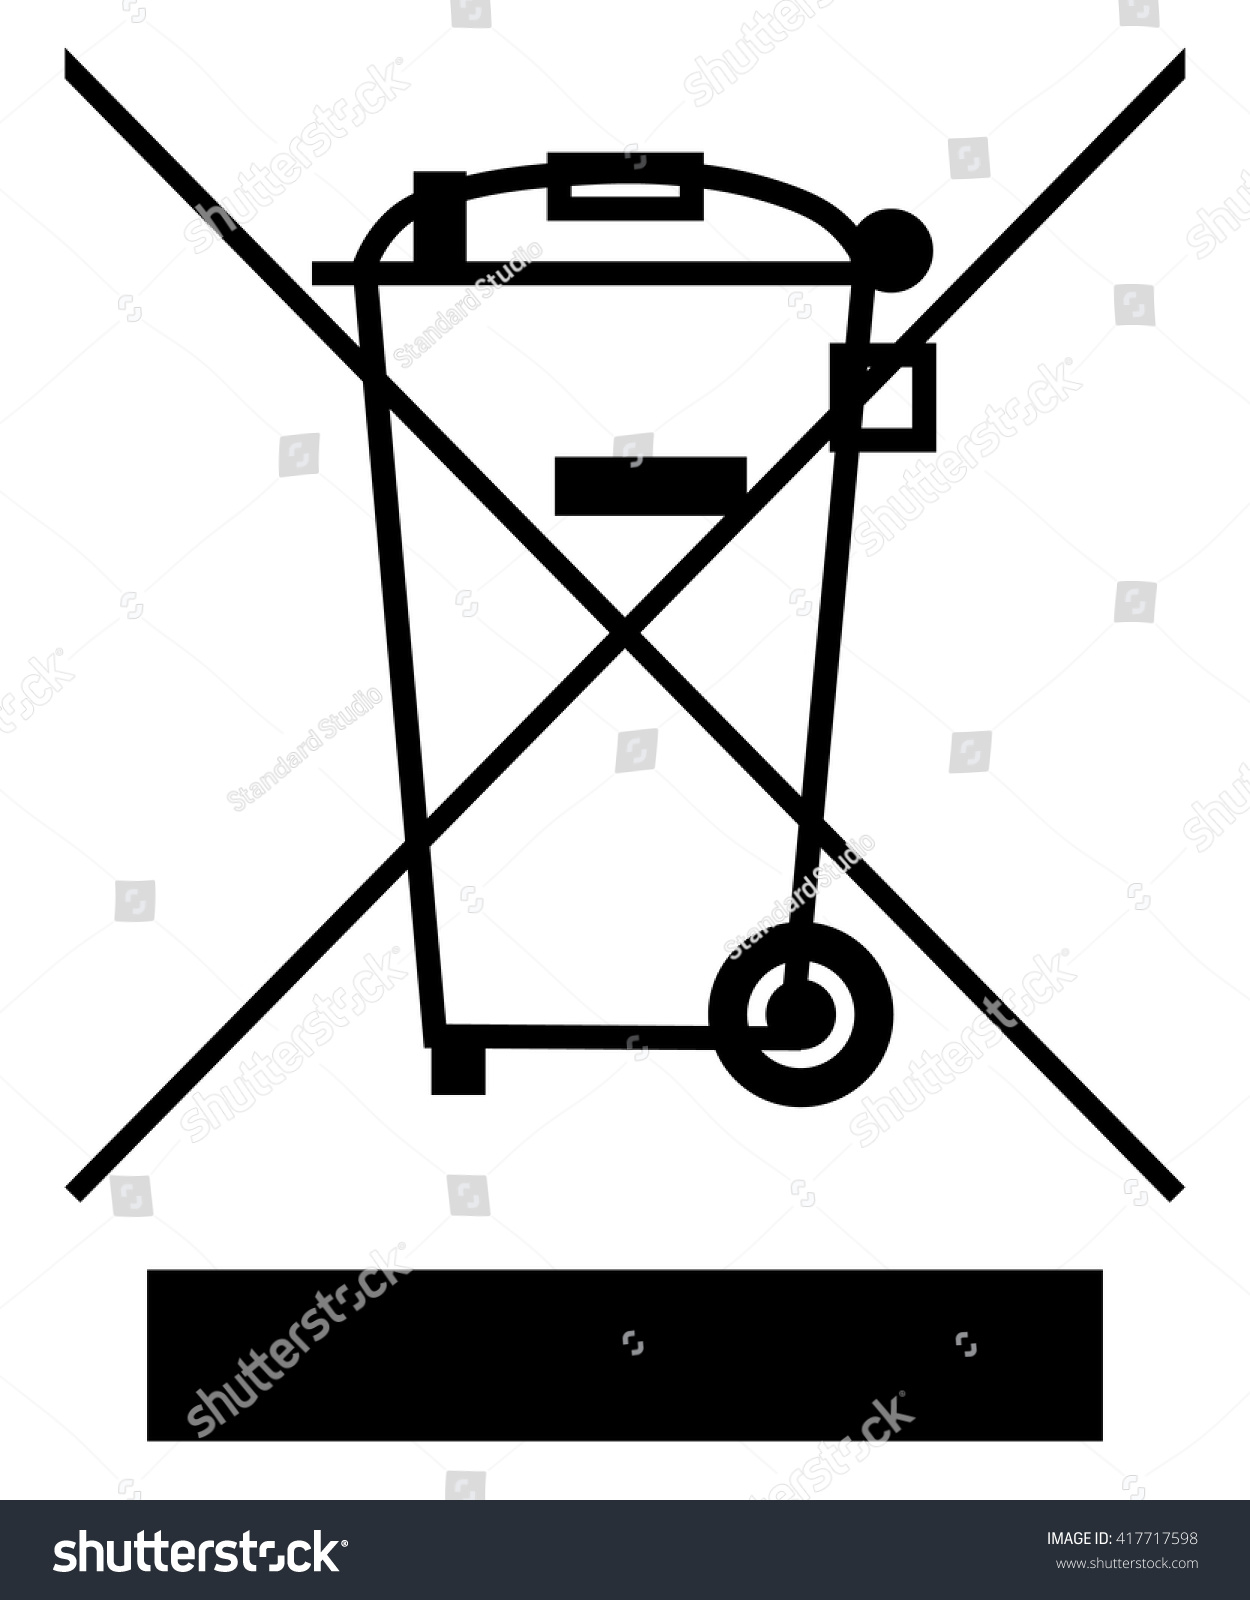 Crossed Out Wheelie Bin Bar Symbol Stock Vector Royalty Free